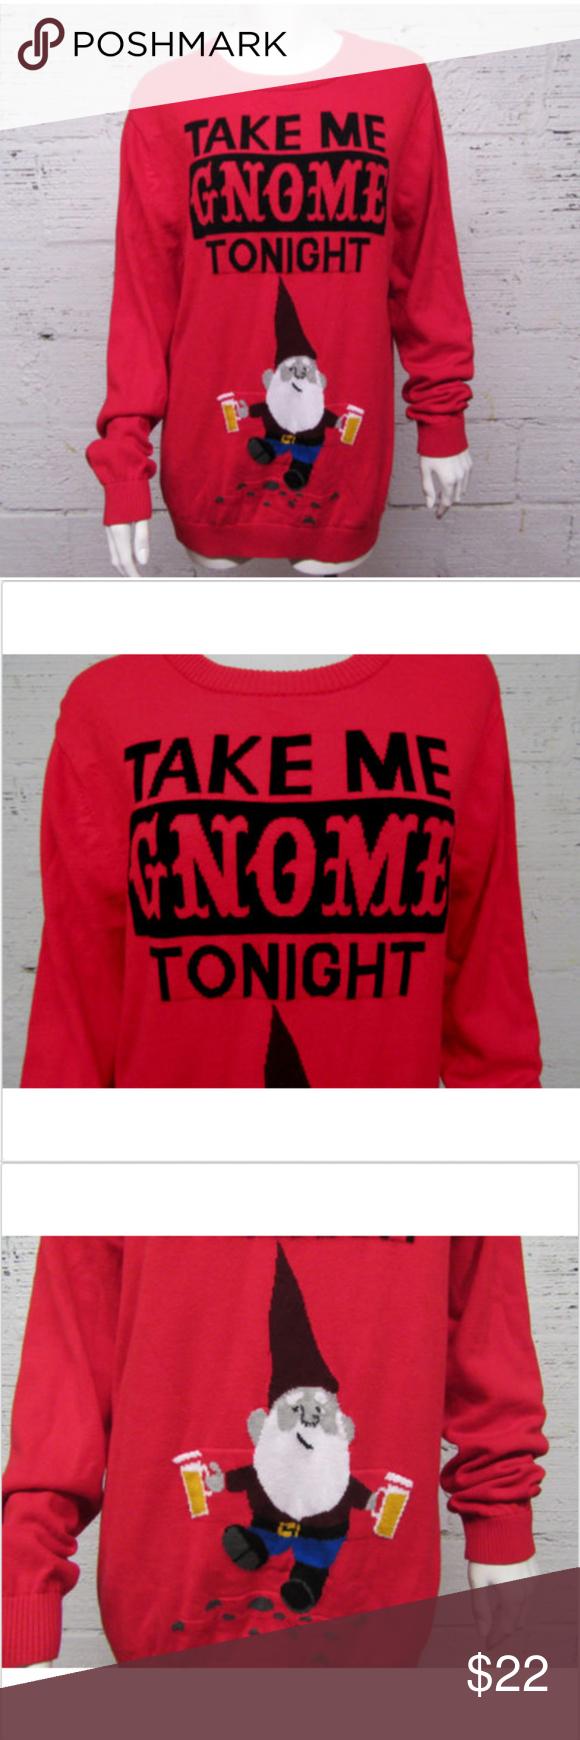 Take Me Gnome Tonight Red Long Sleeve Sweater Take Me Gnome Tonight